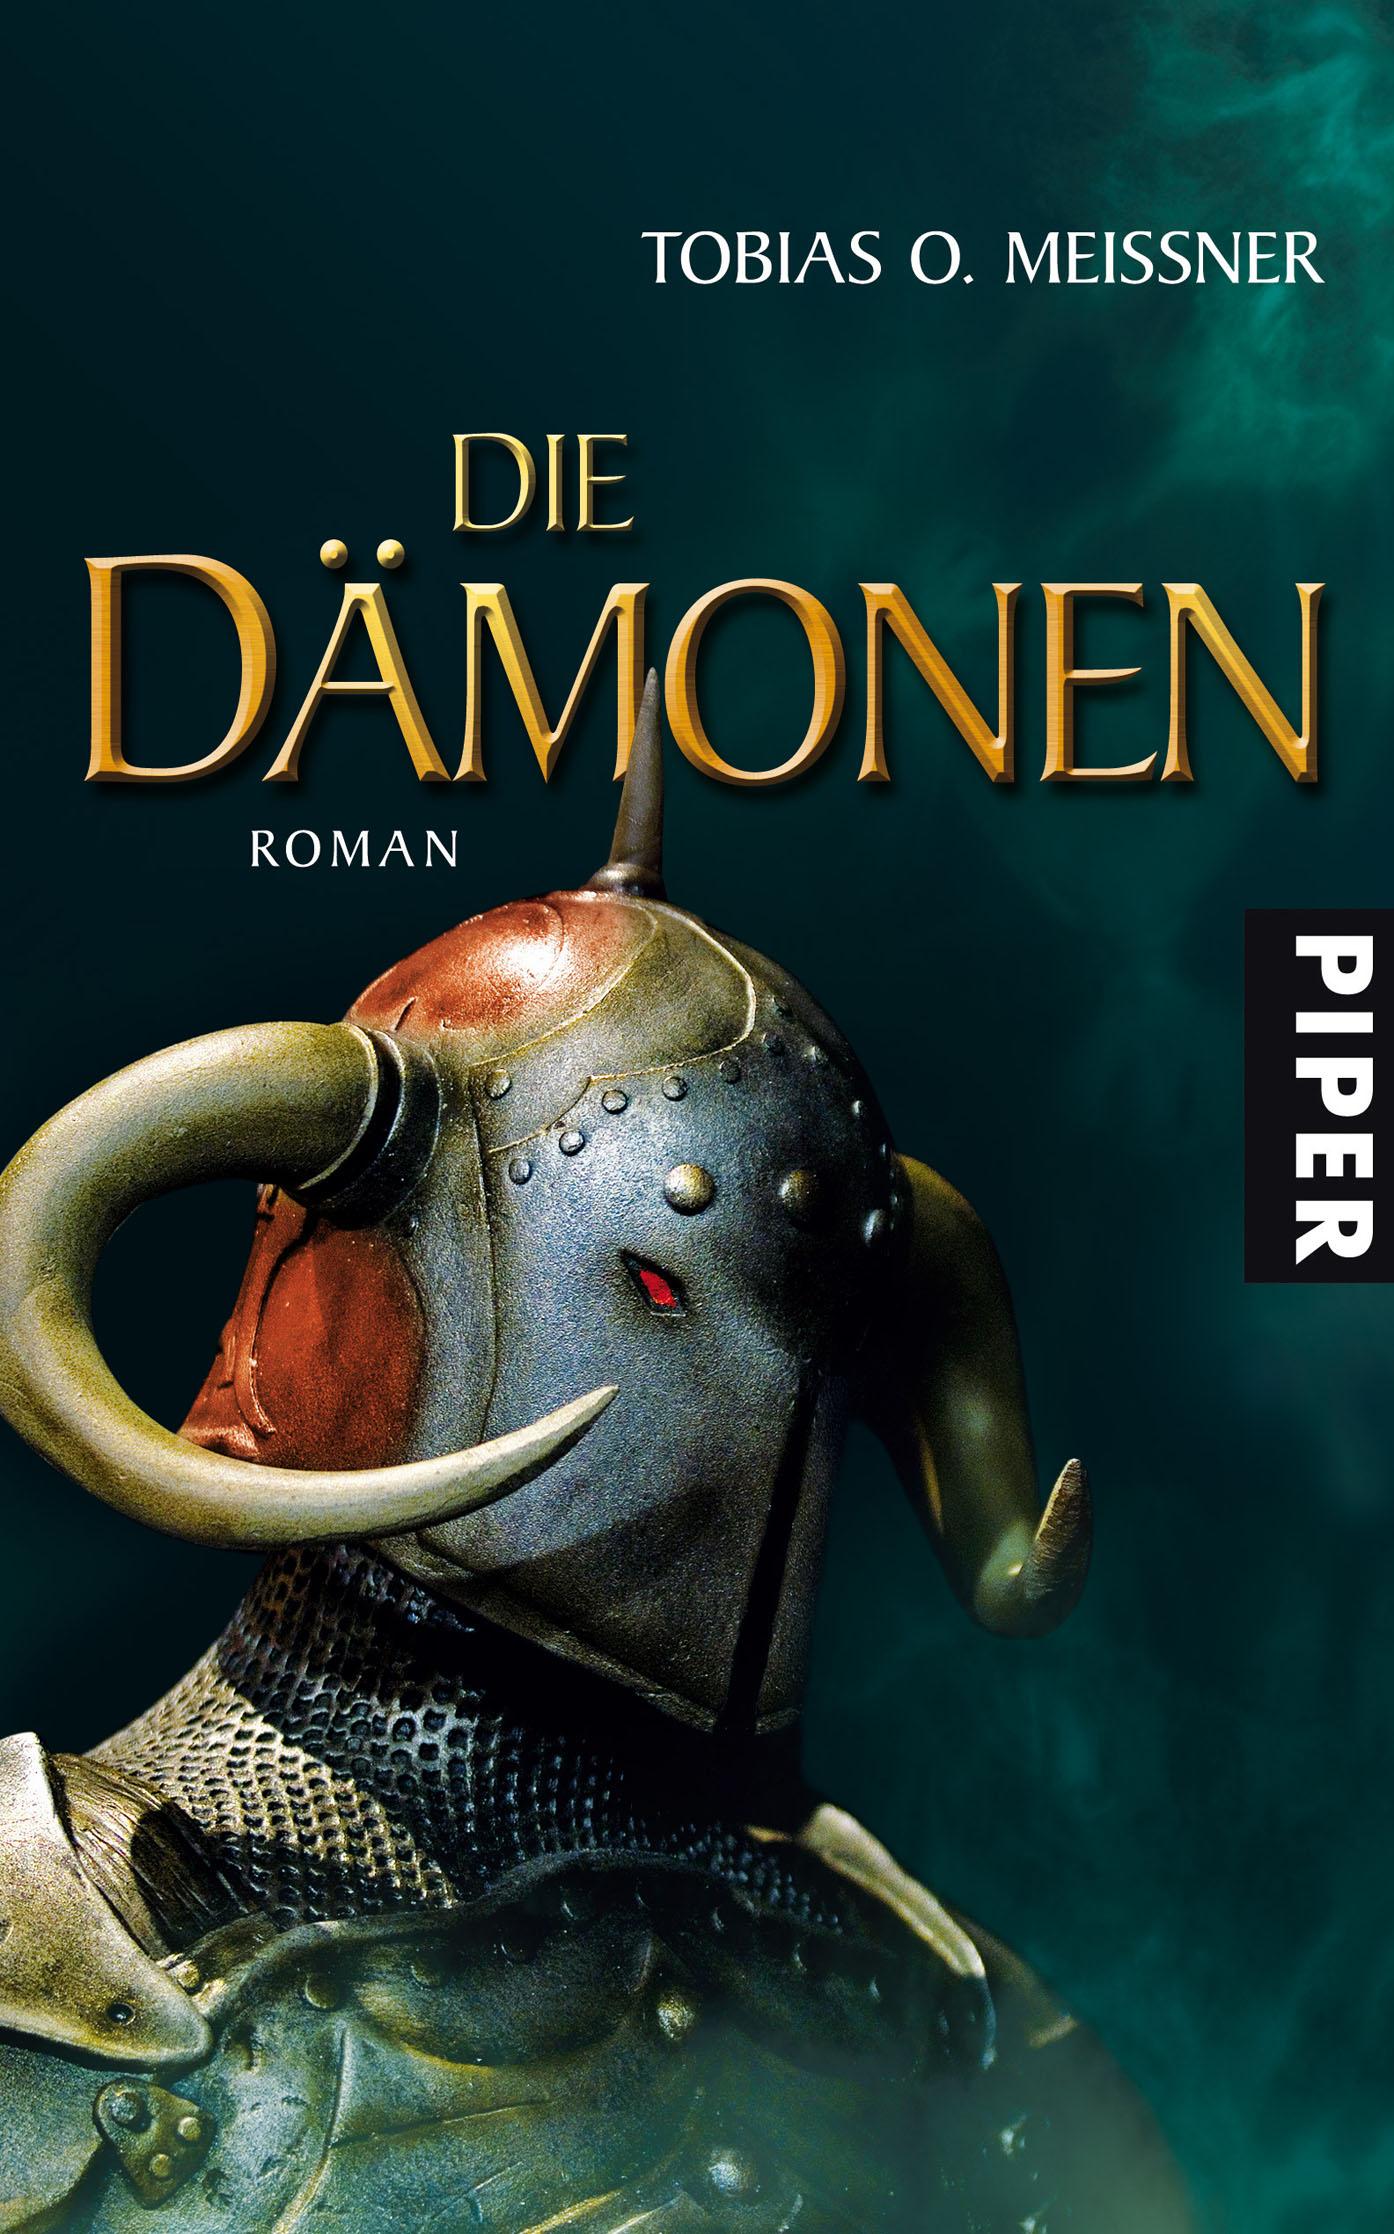 Die Dämonen - Tobias O. Meißner